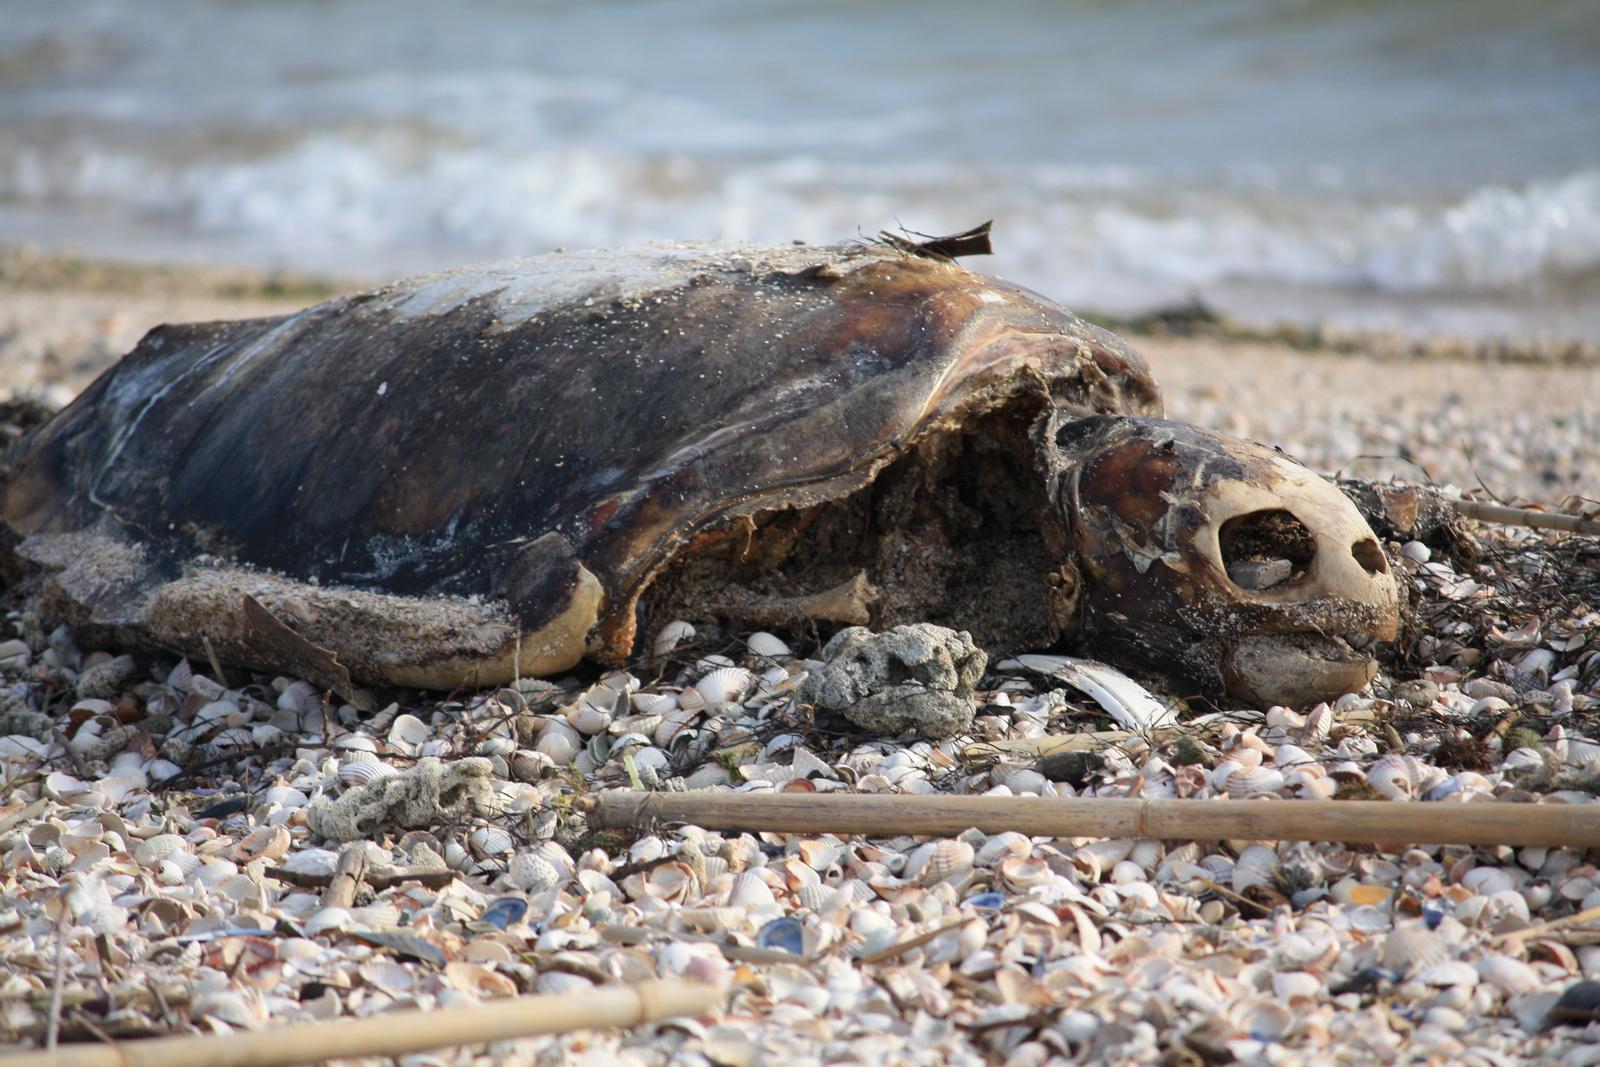 IMG_7469 Νεκρή χελώνα_resize